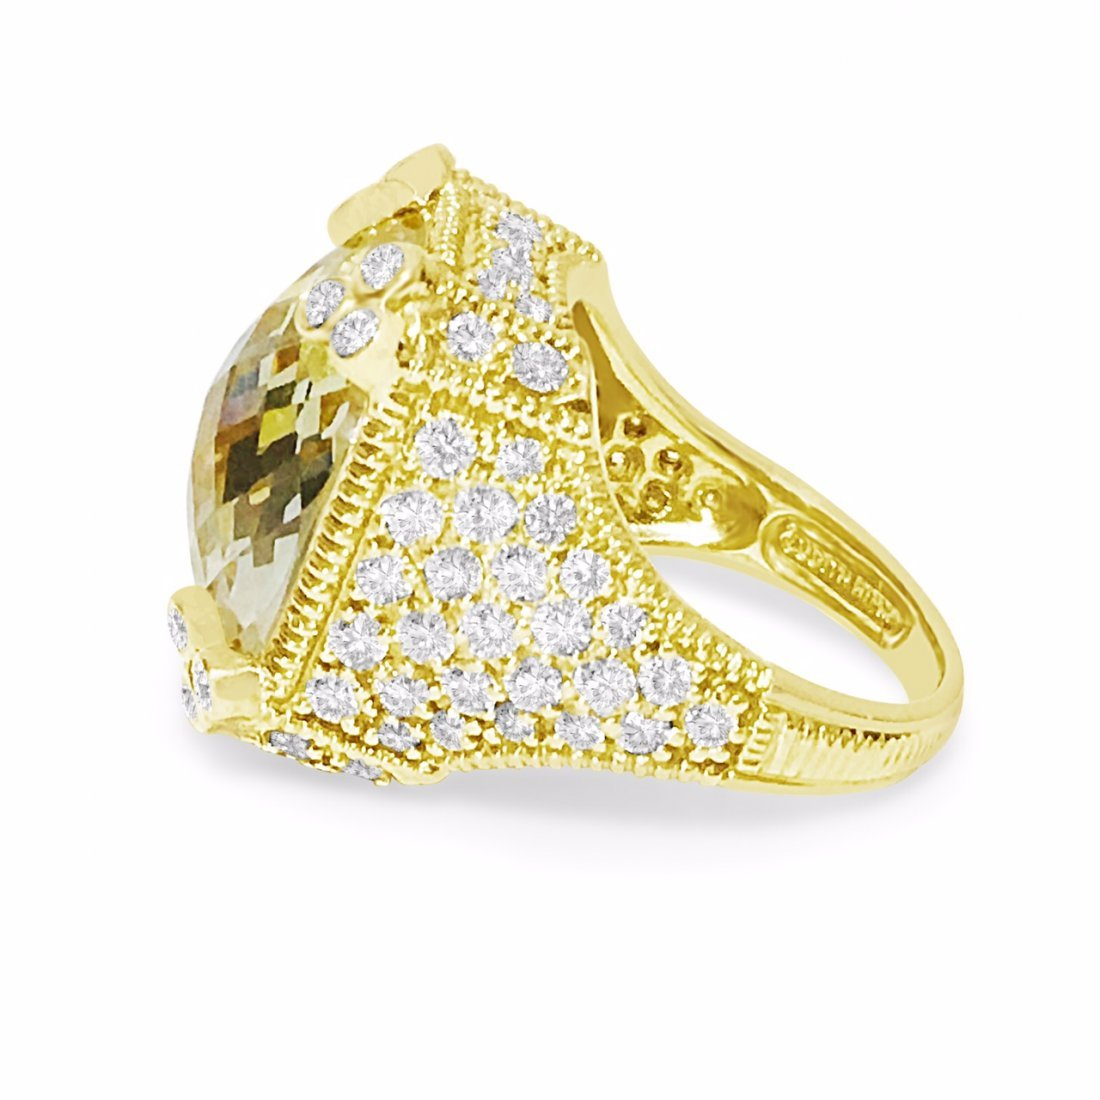 Judith Ripka 18K Gold Natural Diamond Cocktail Ring - 2